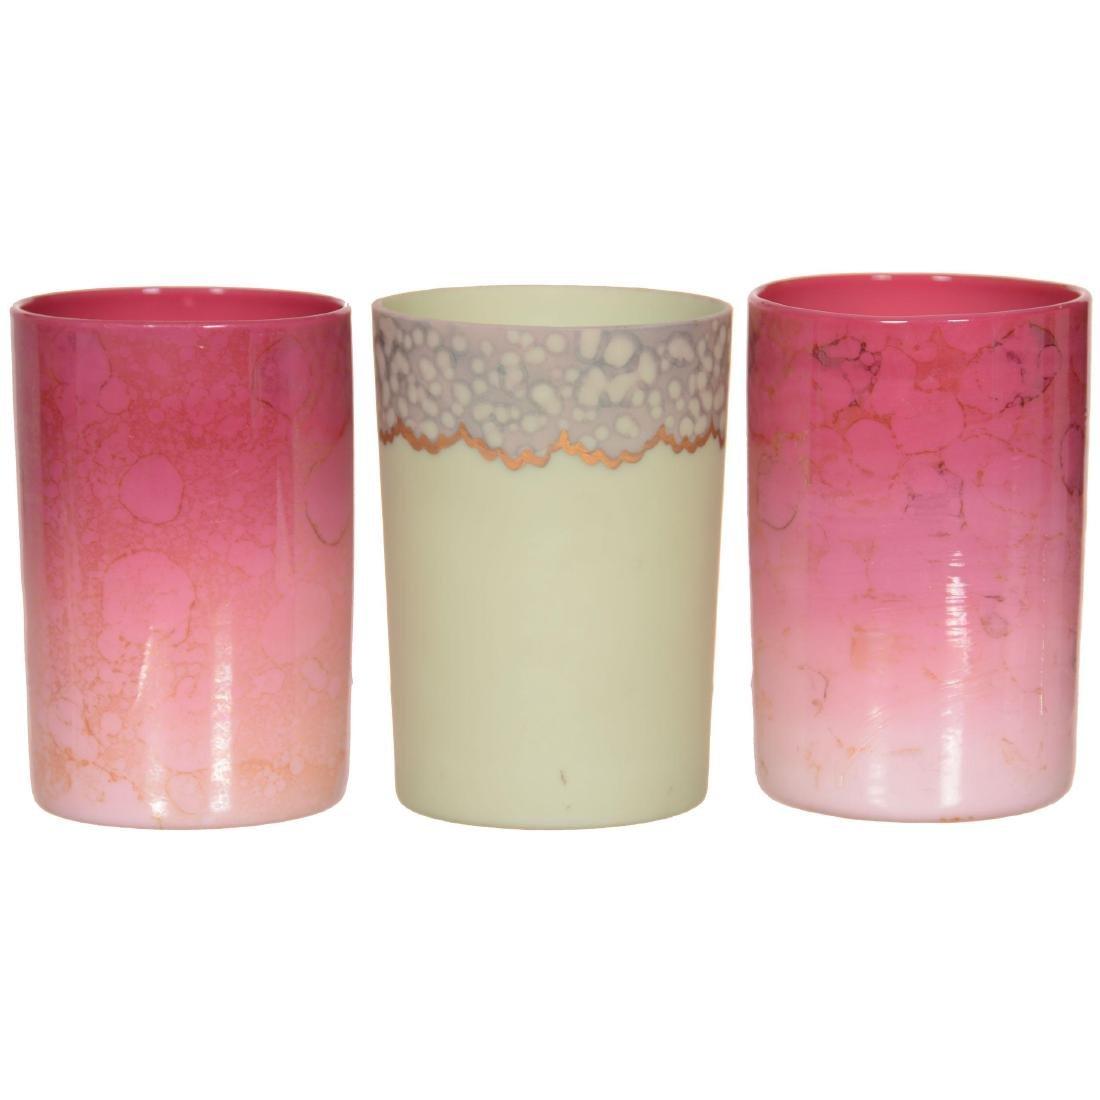 (3) New England Art Glass Tumblers